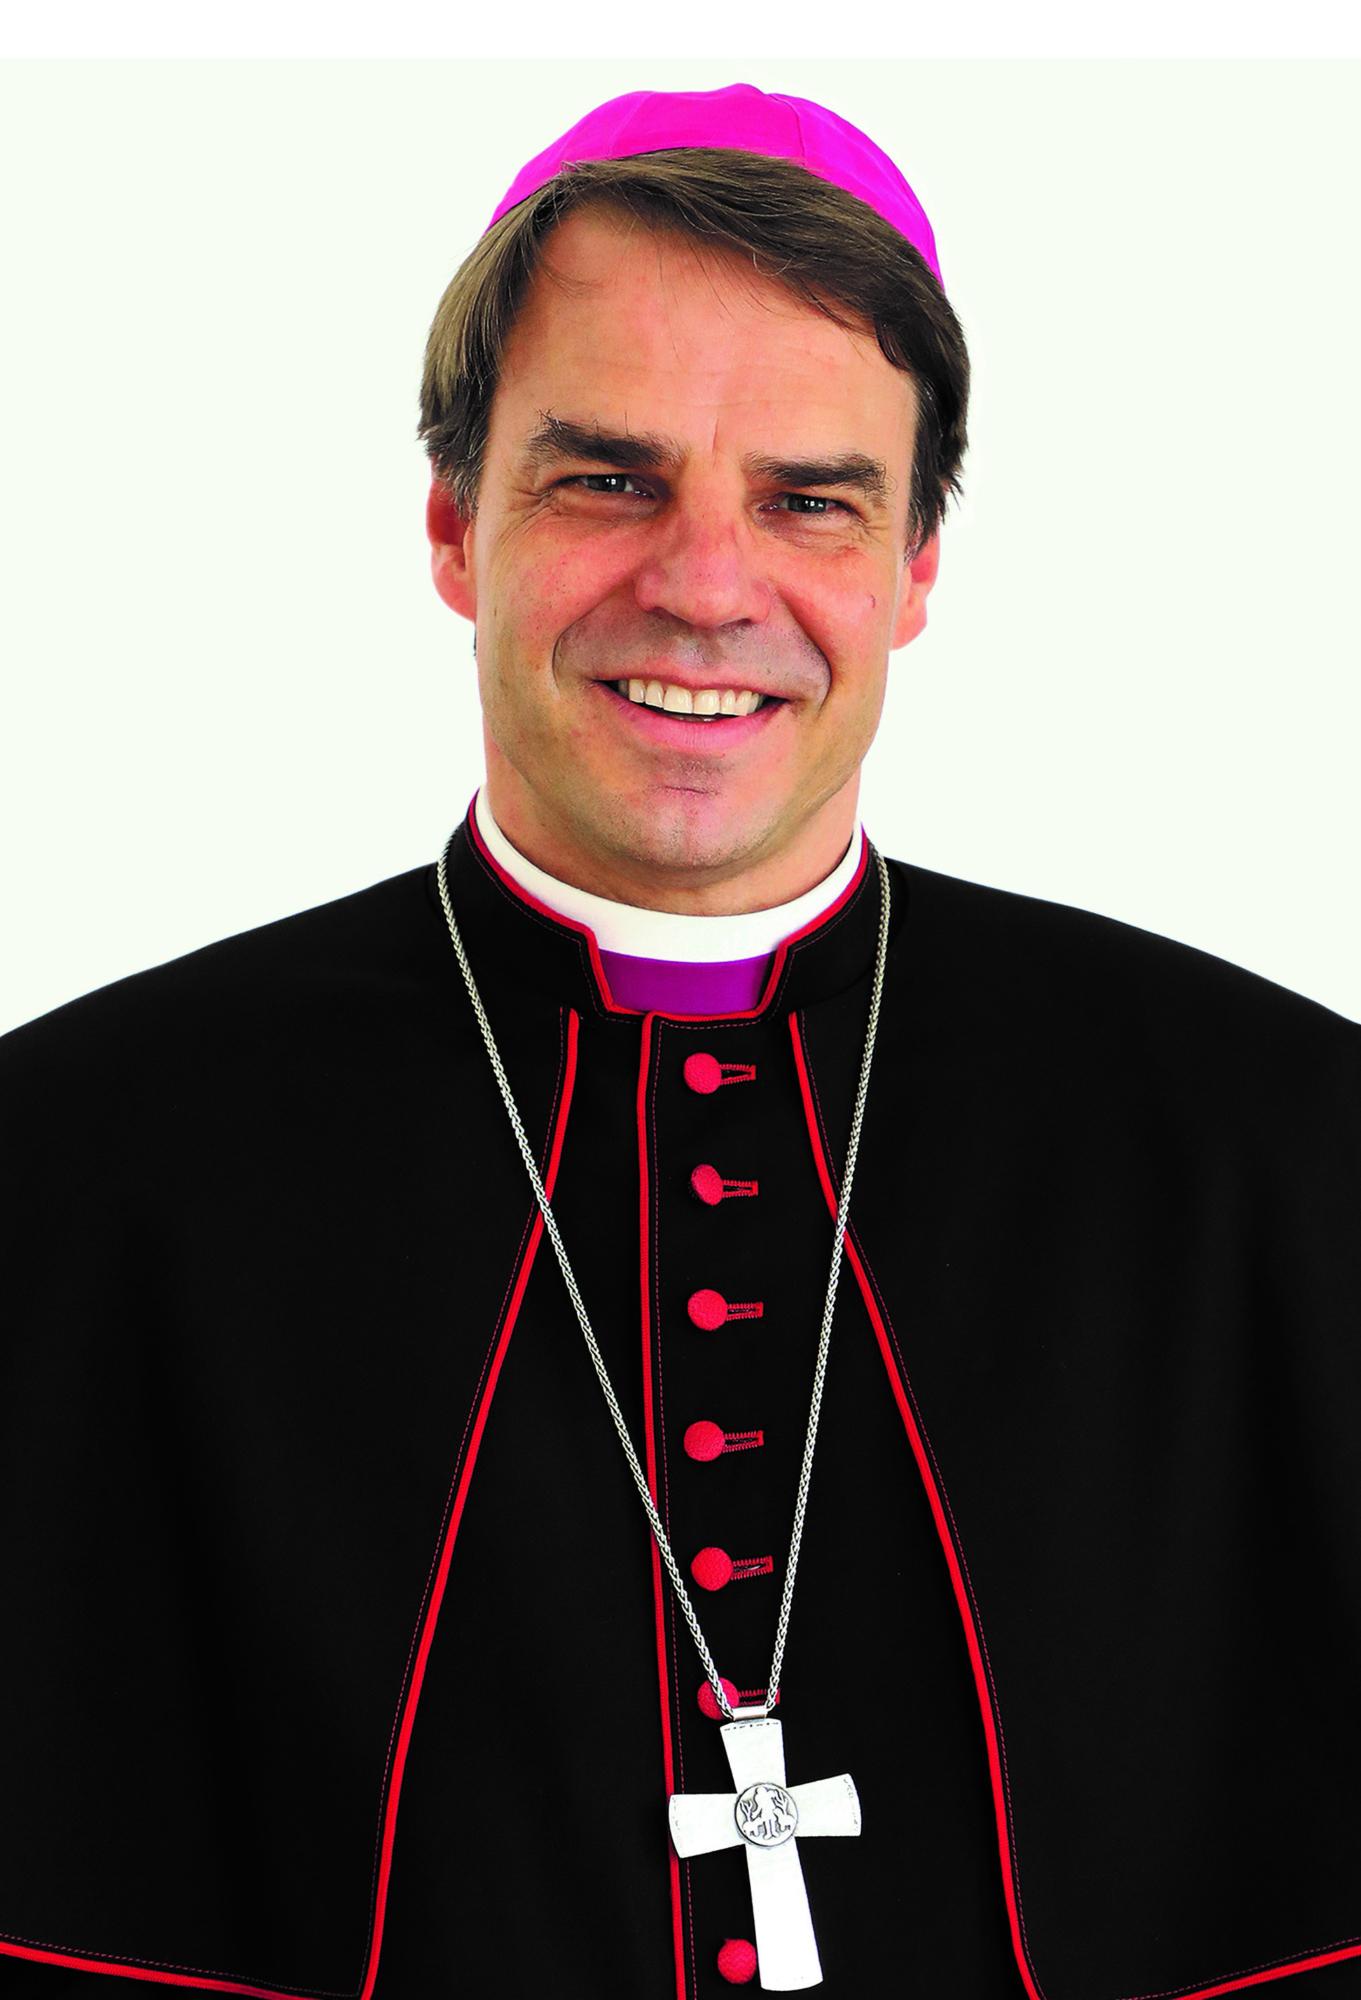 Bischof Dr. Stefan Oster SDB S02 oster PB